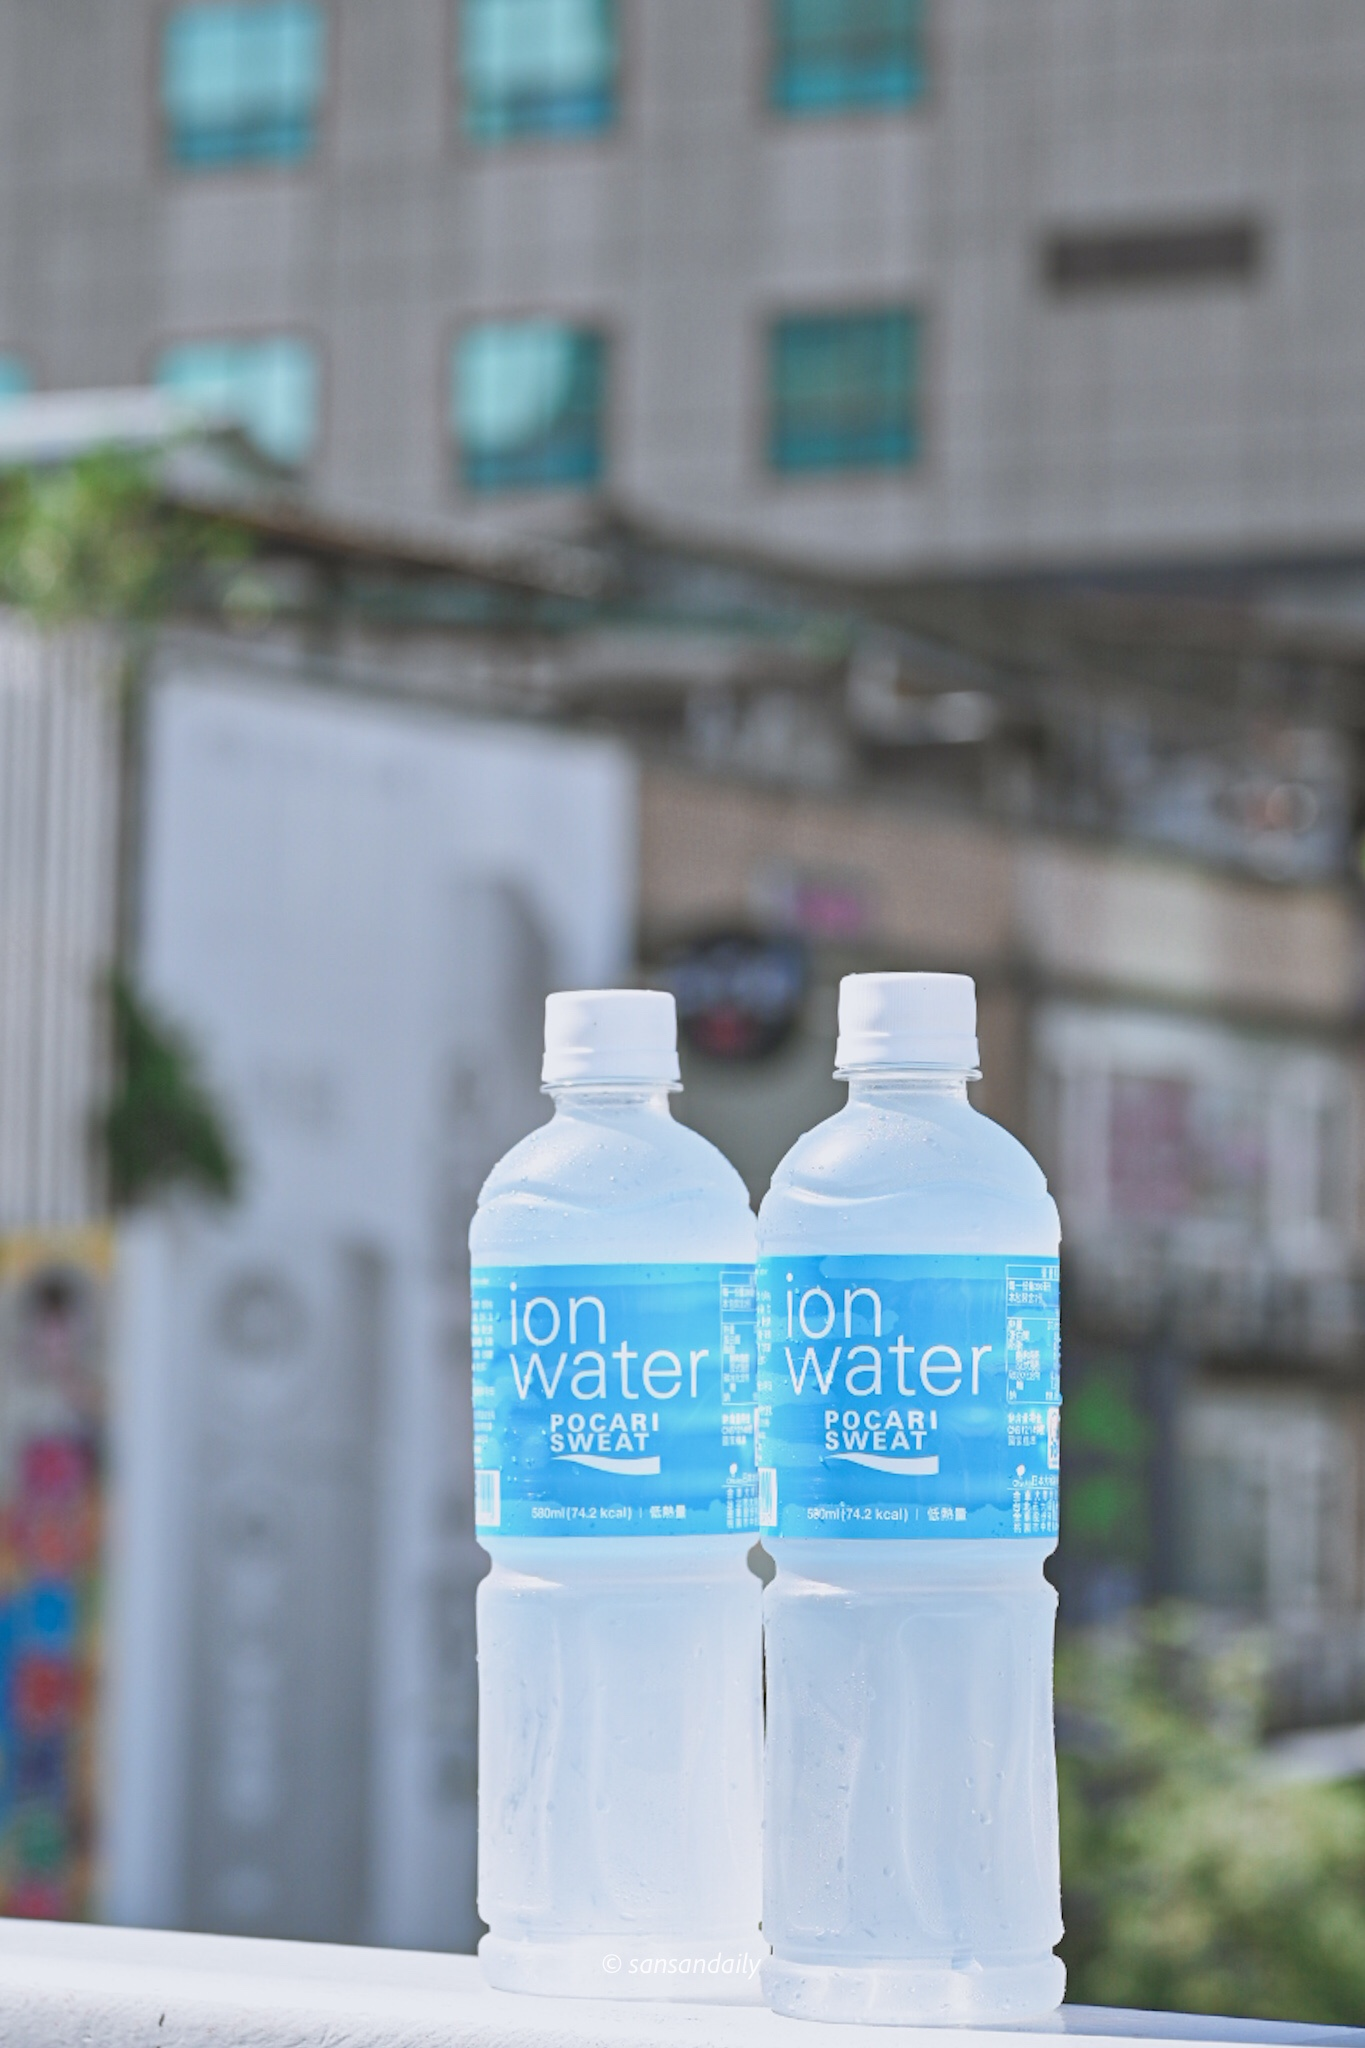 ion water寶礦力水得